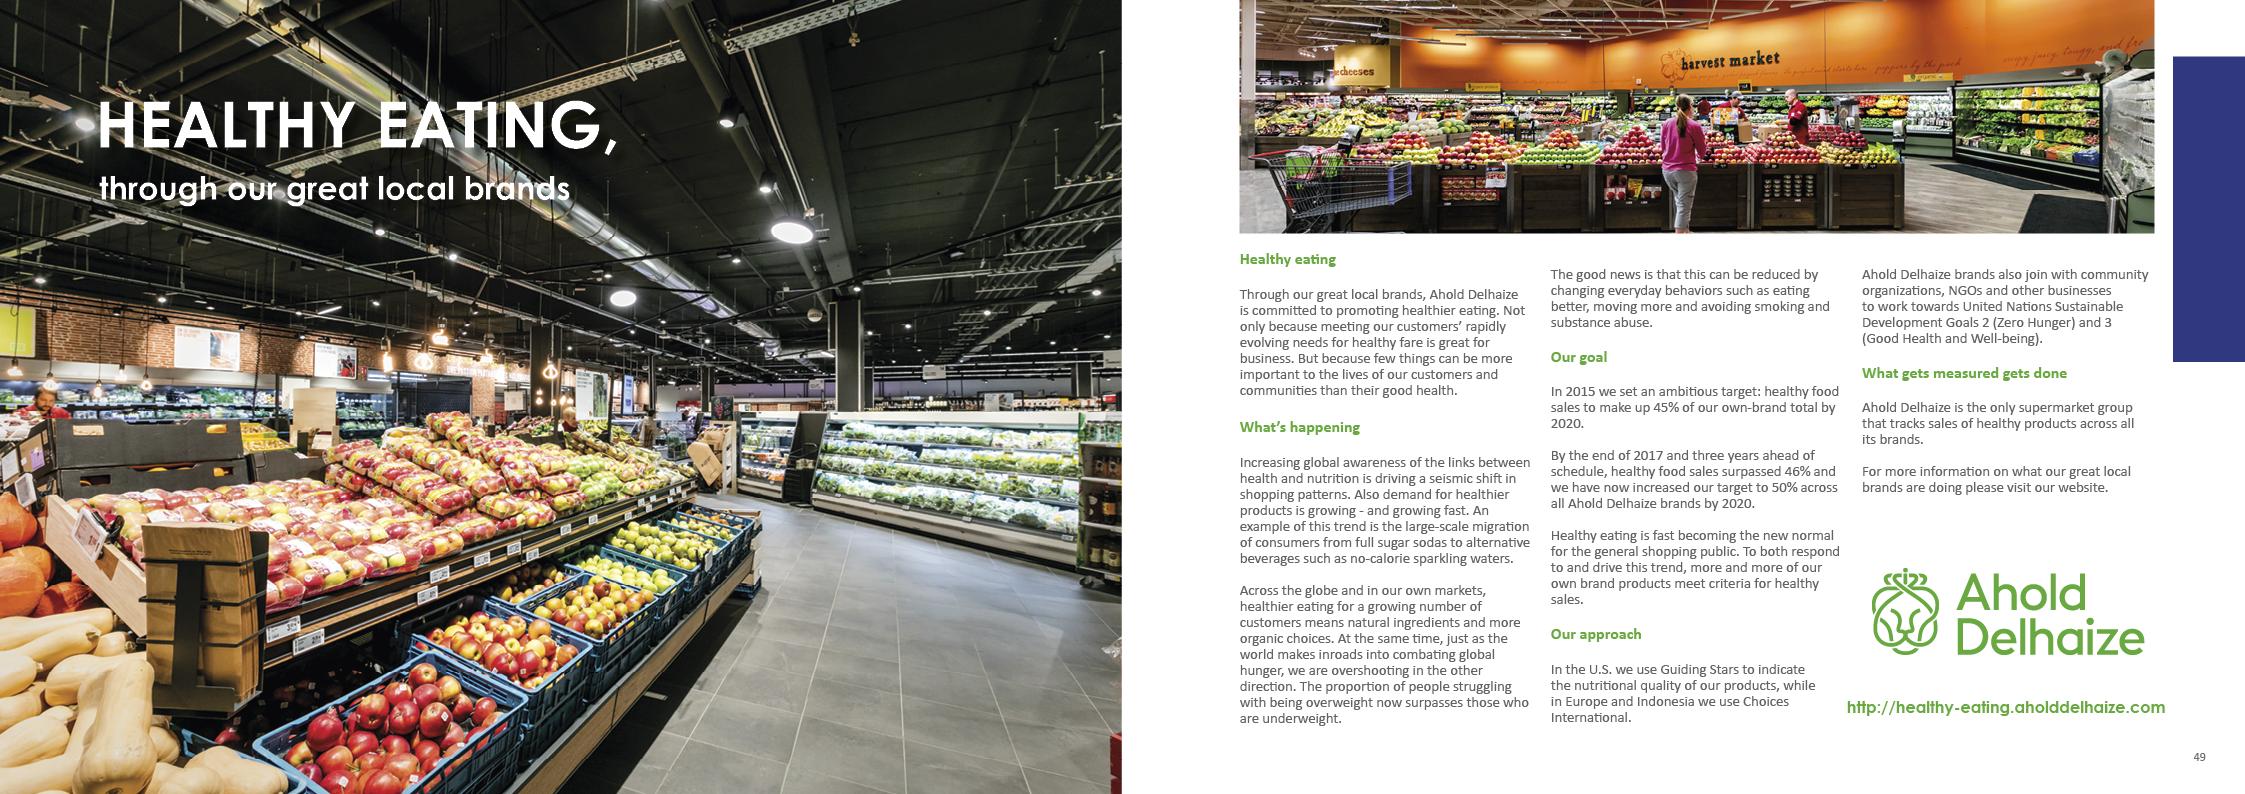 Ahold Dehaize - Metropolitan Food Security